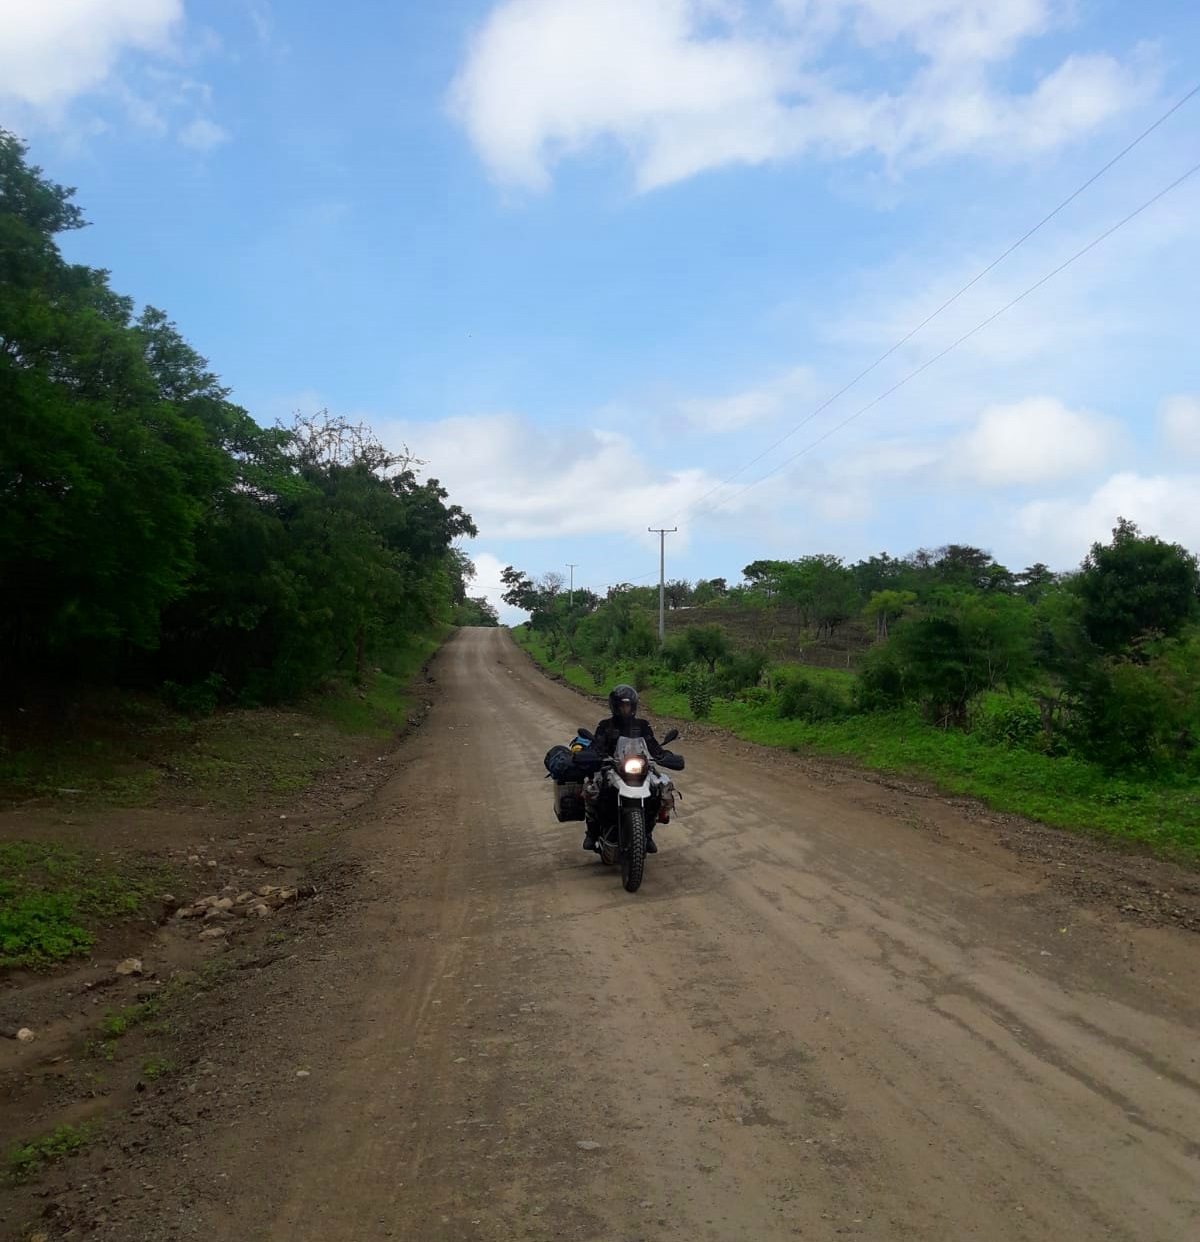 Road to El Transito, Nicaragua